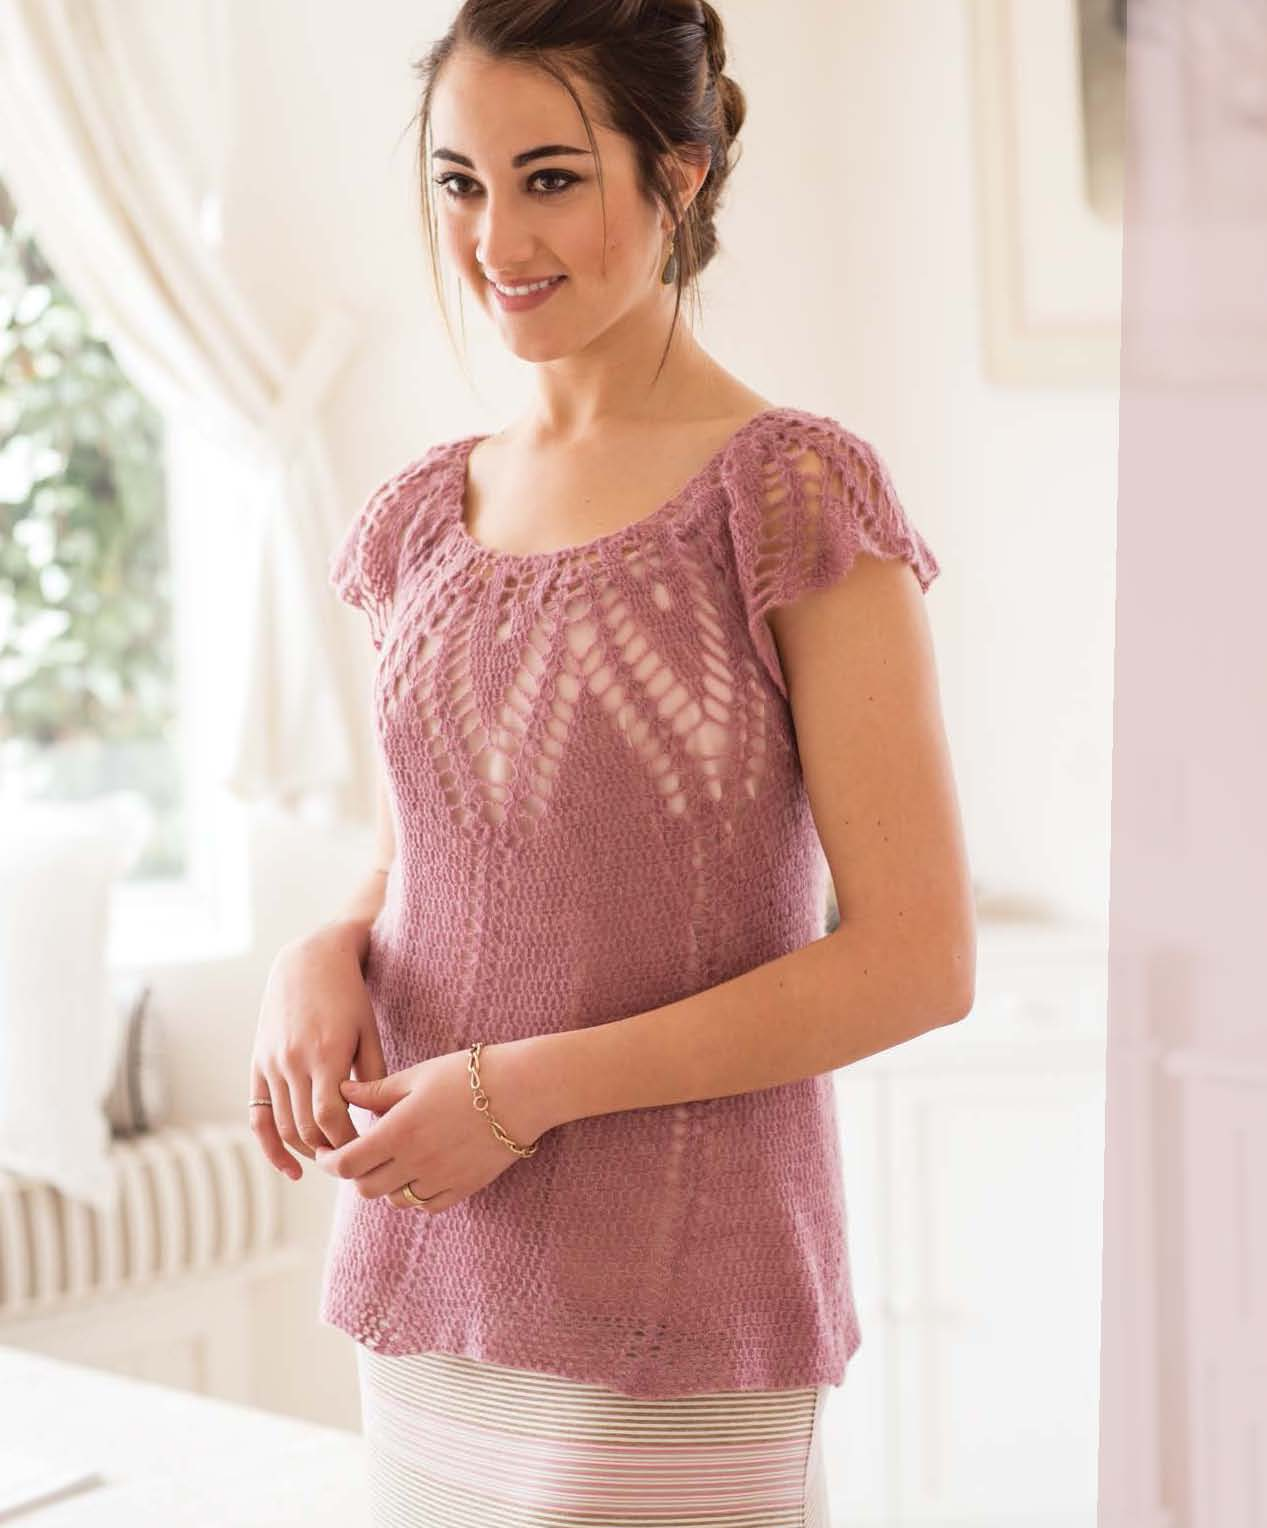 Crochet So Lovely -  Liliana Pullover beauty shot.jpg